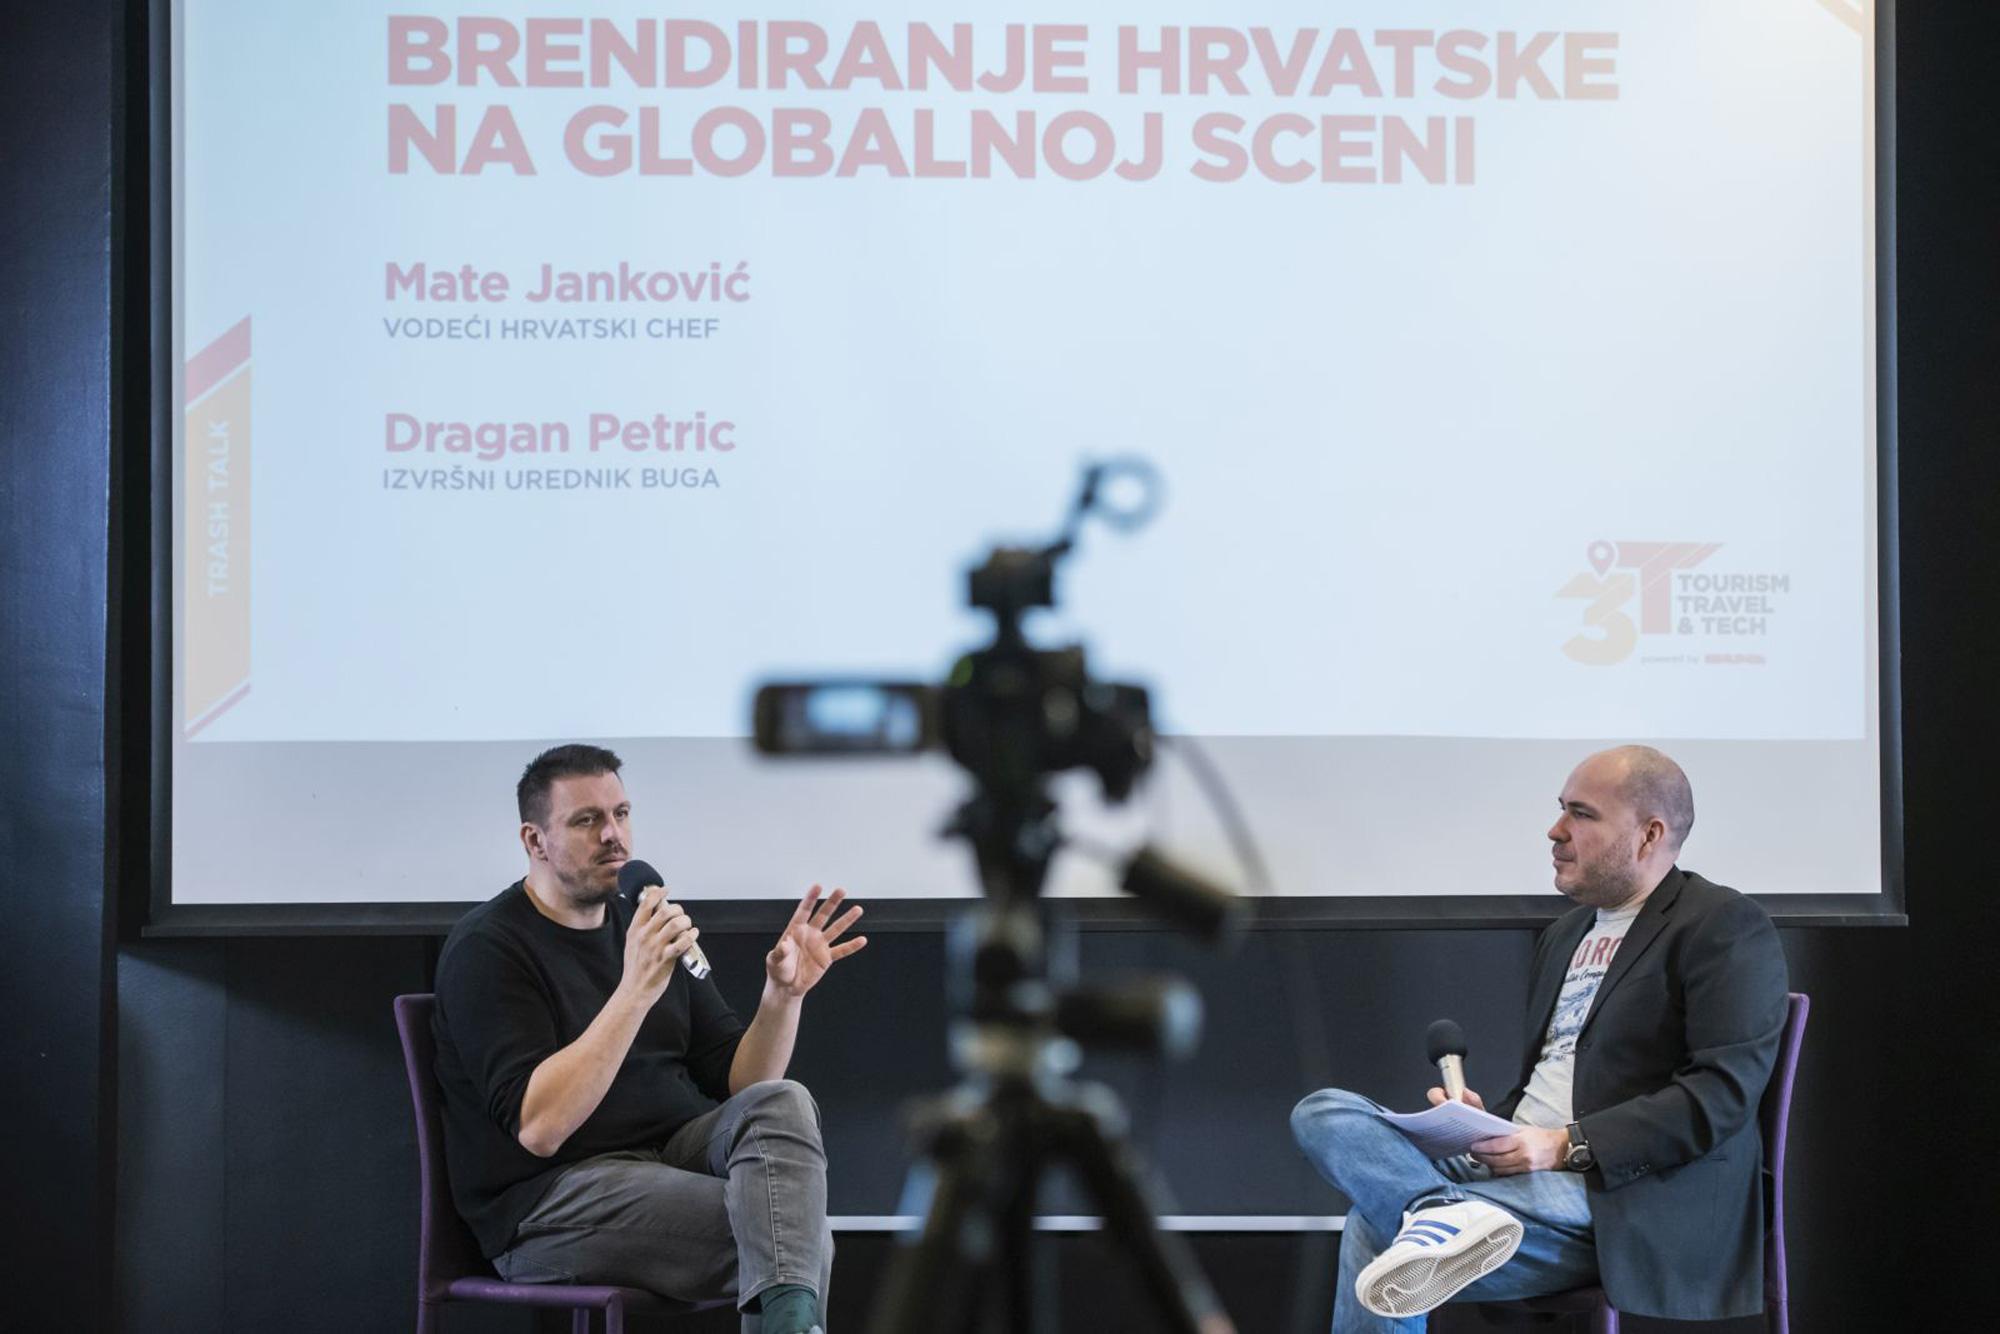 Mate Janković i Dragan Petric